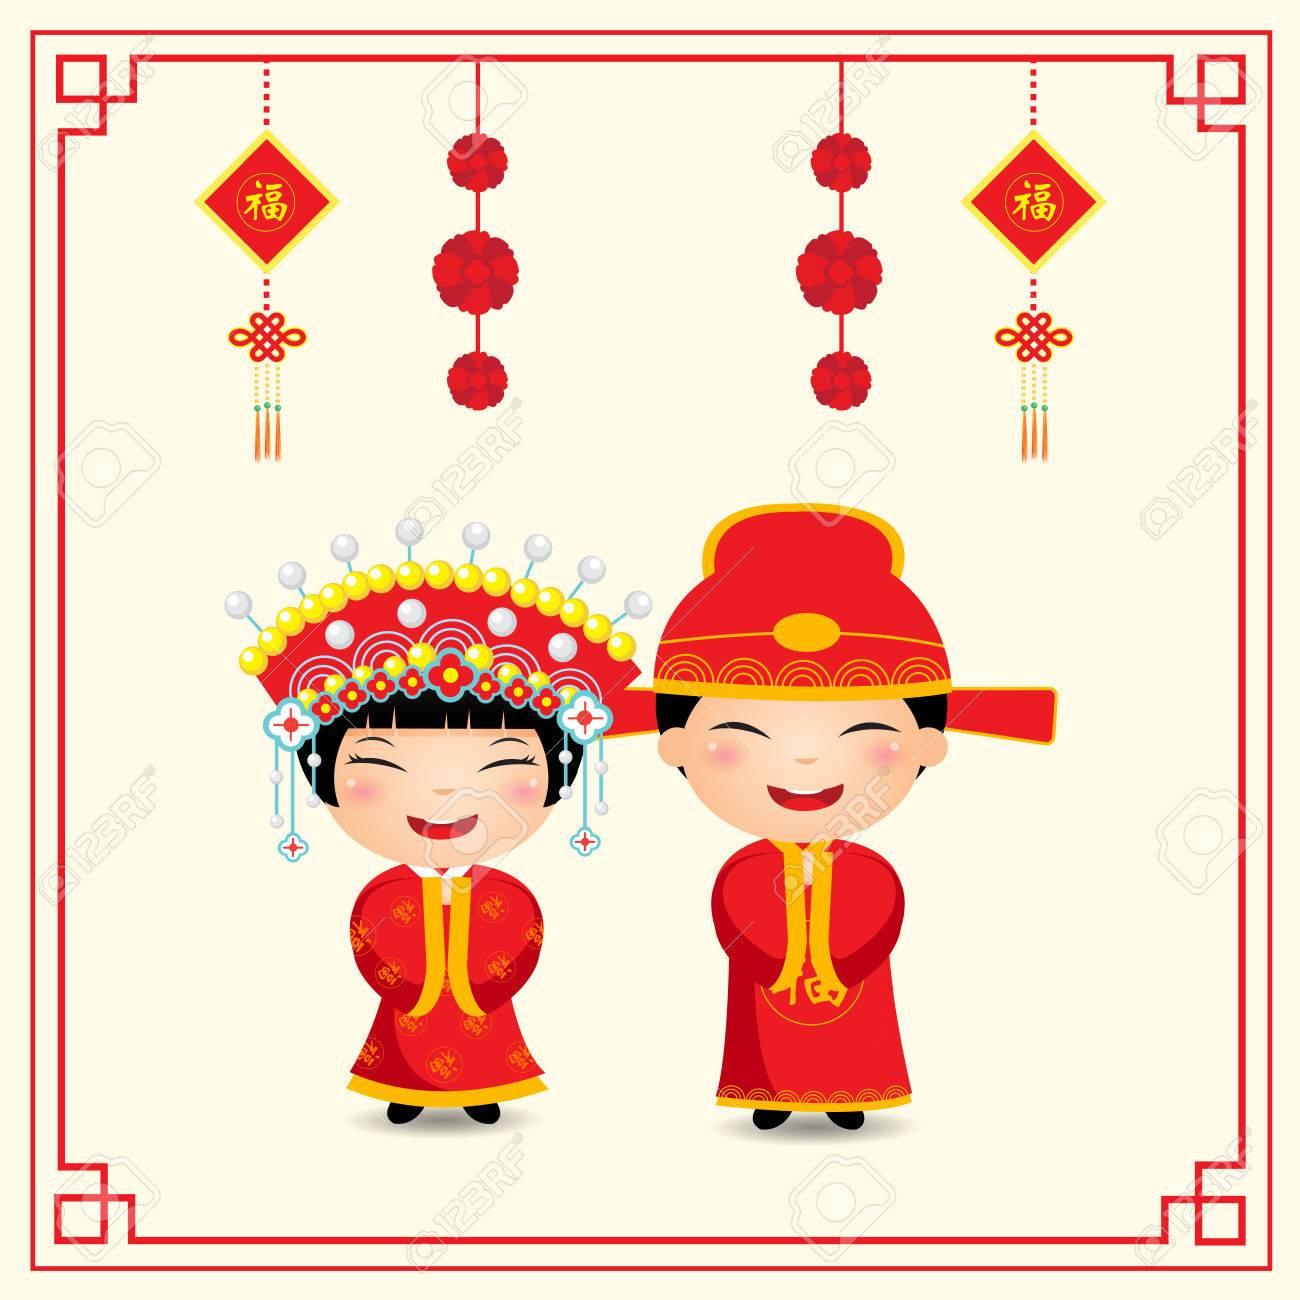 Cartoon Chinese Bride And Groom, Wedding Invitation Card Template